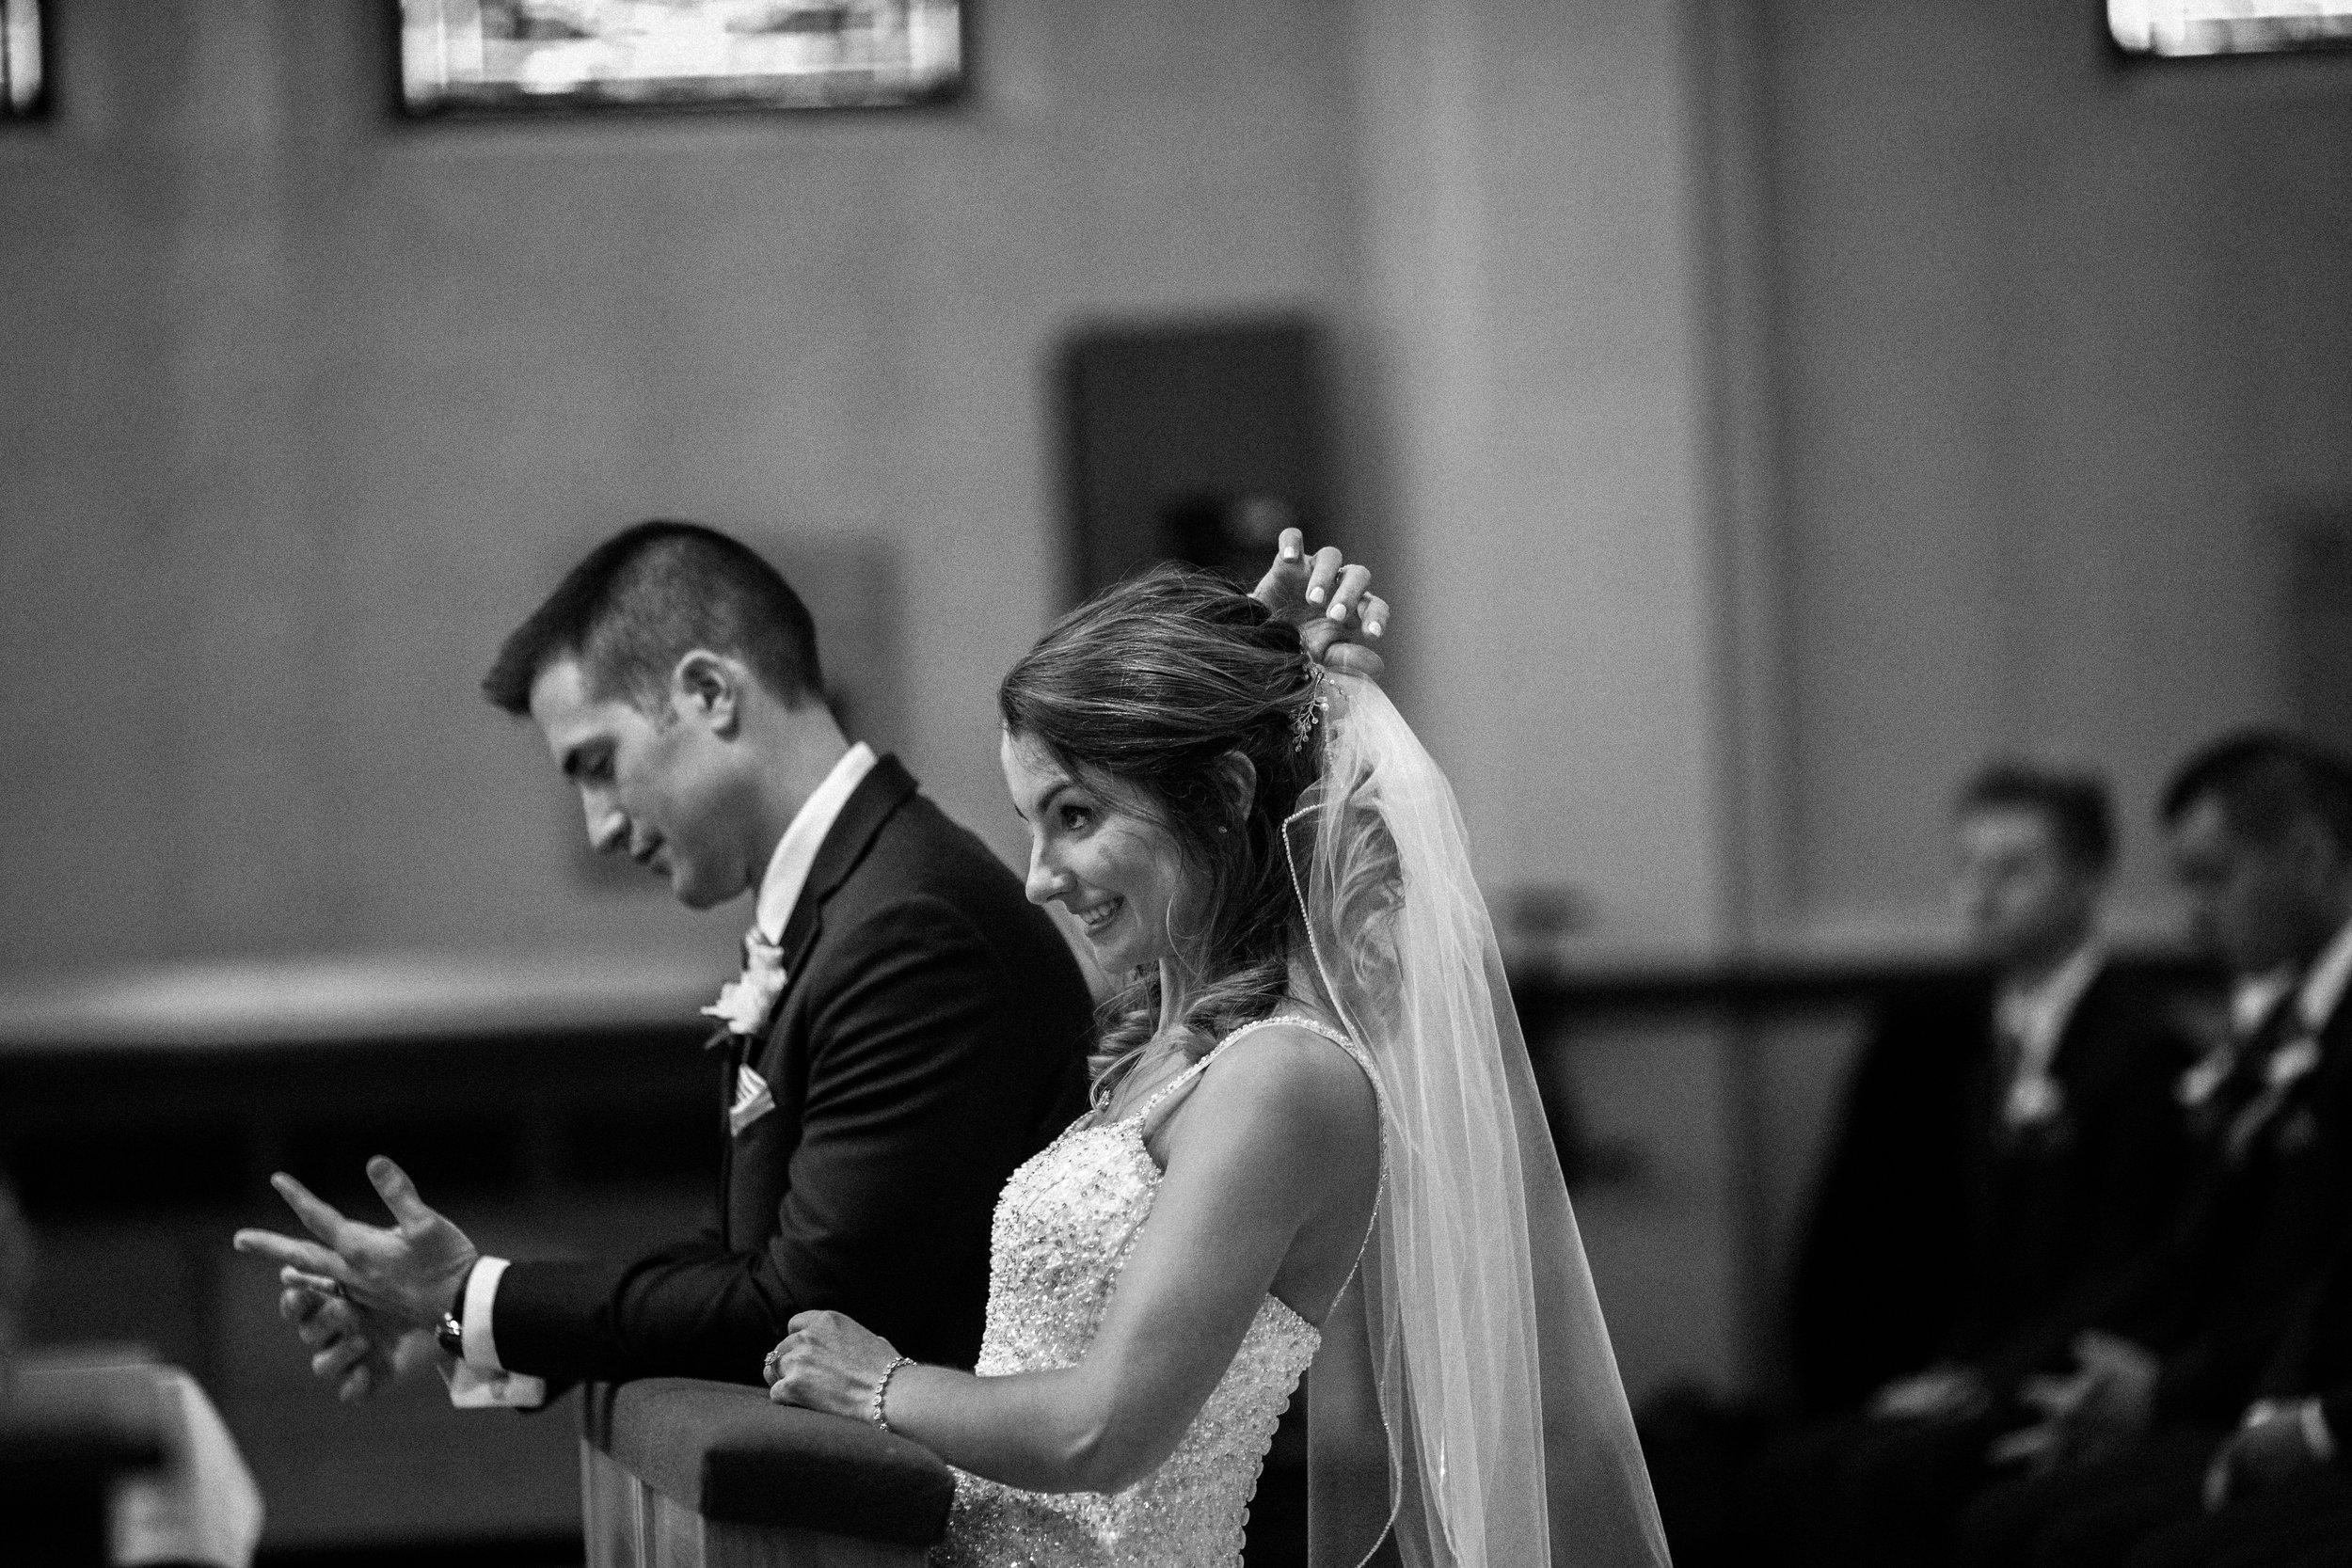 Wedding-couple-takes-photos-at-lowes-hardware-due-to-rain31.jpg